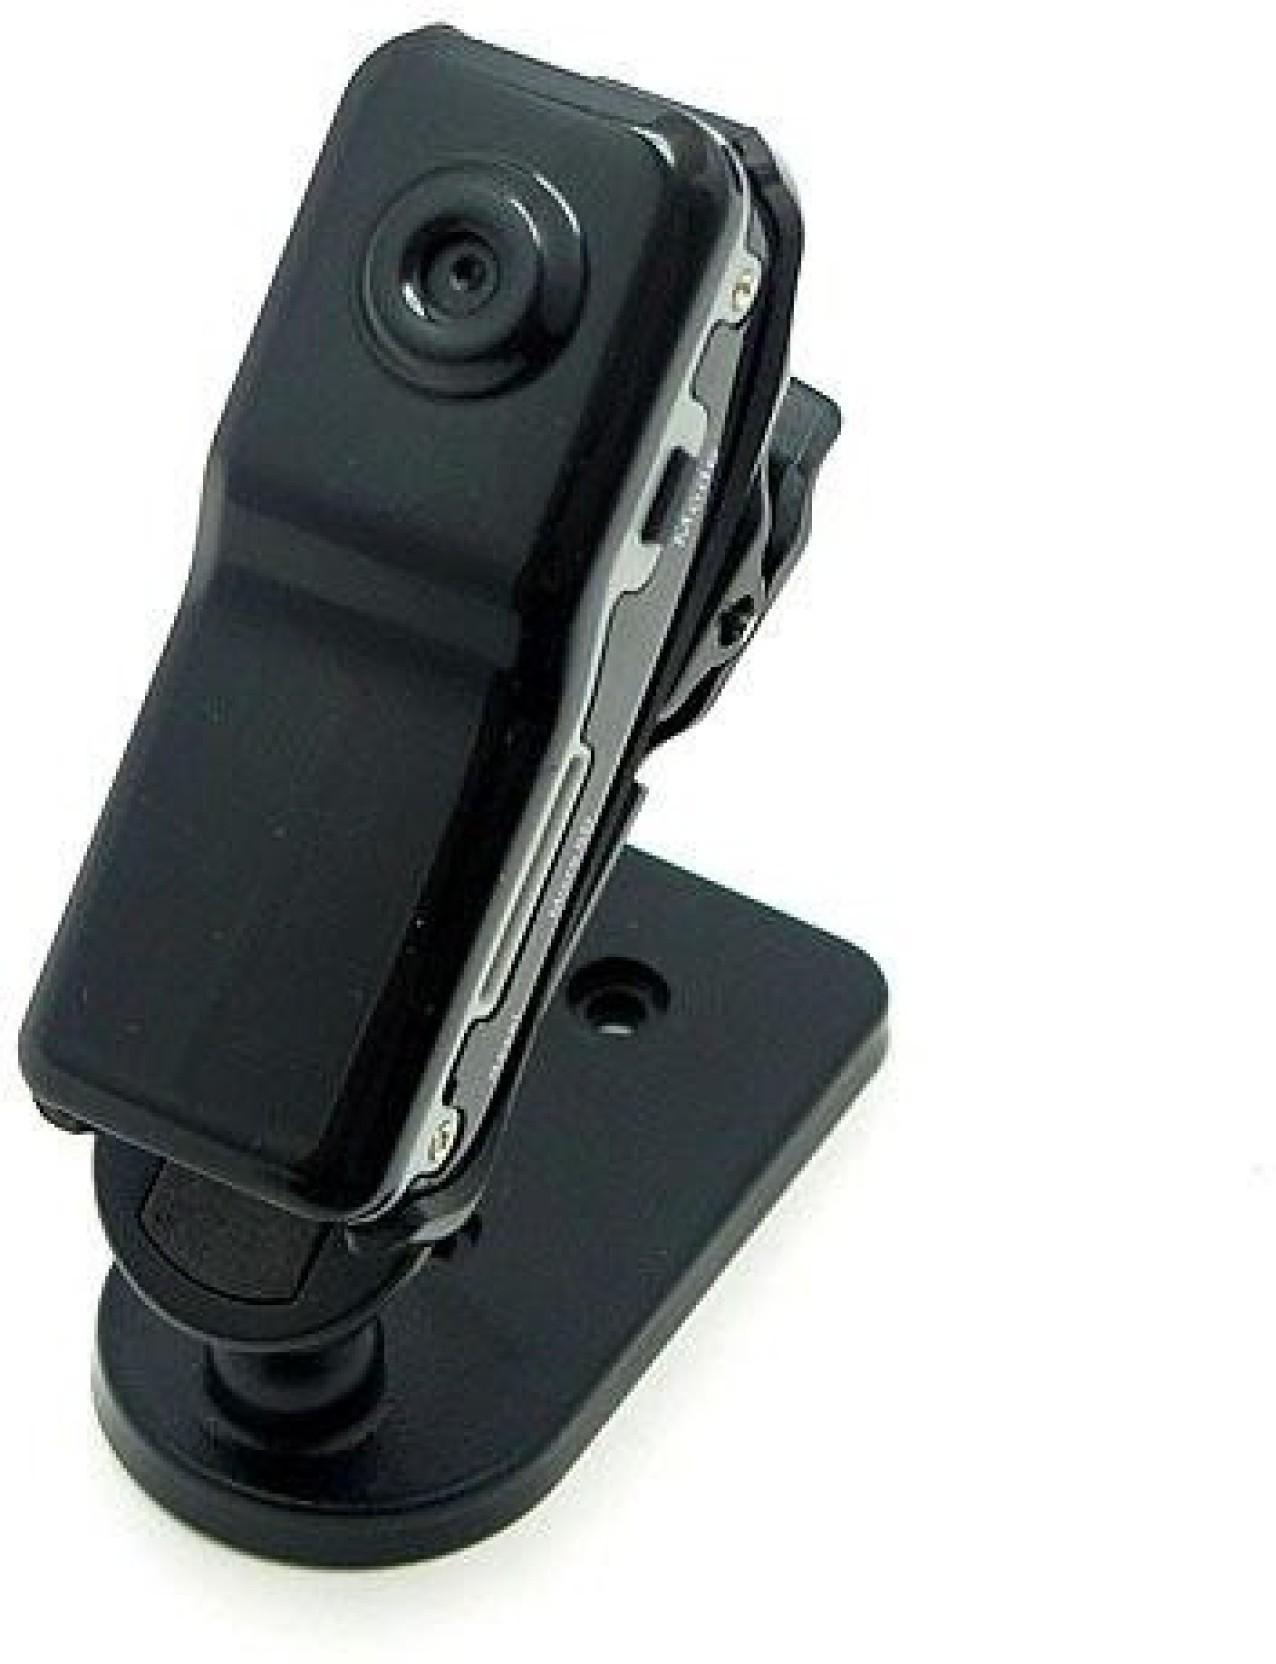 Hidden Audio Video Recorder Spy Camera Add To Cart